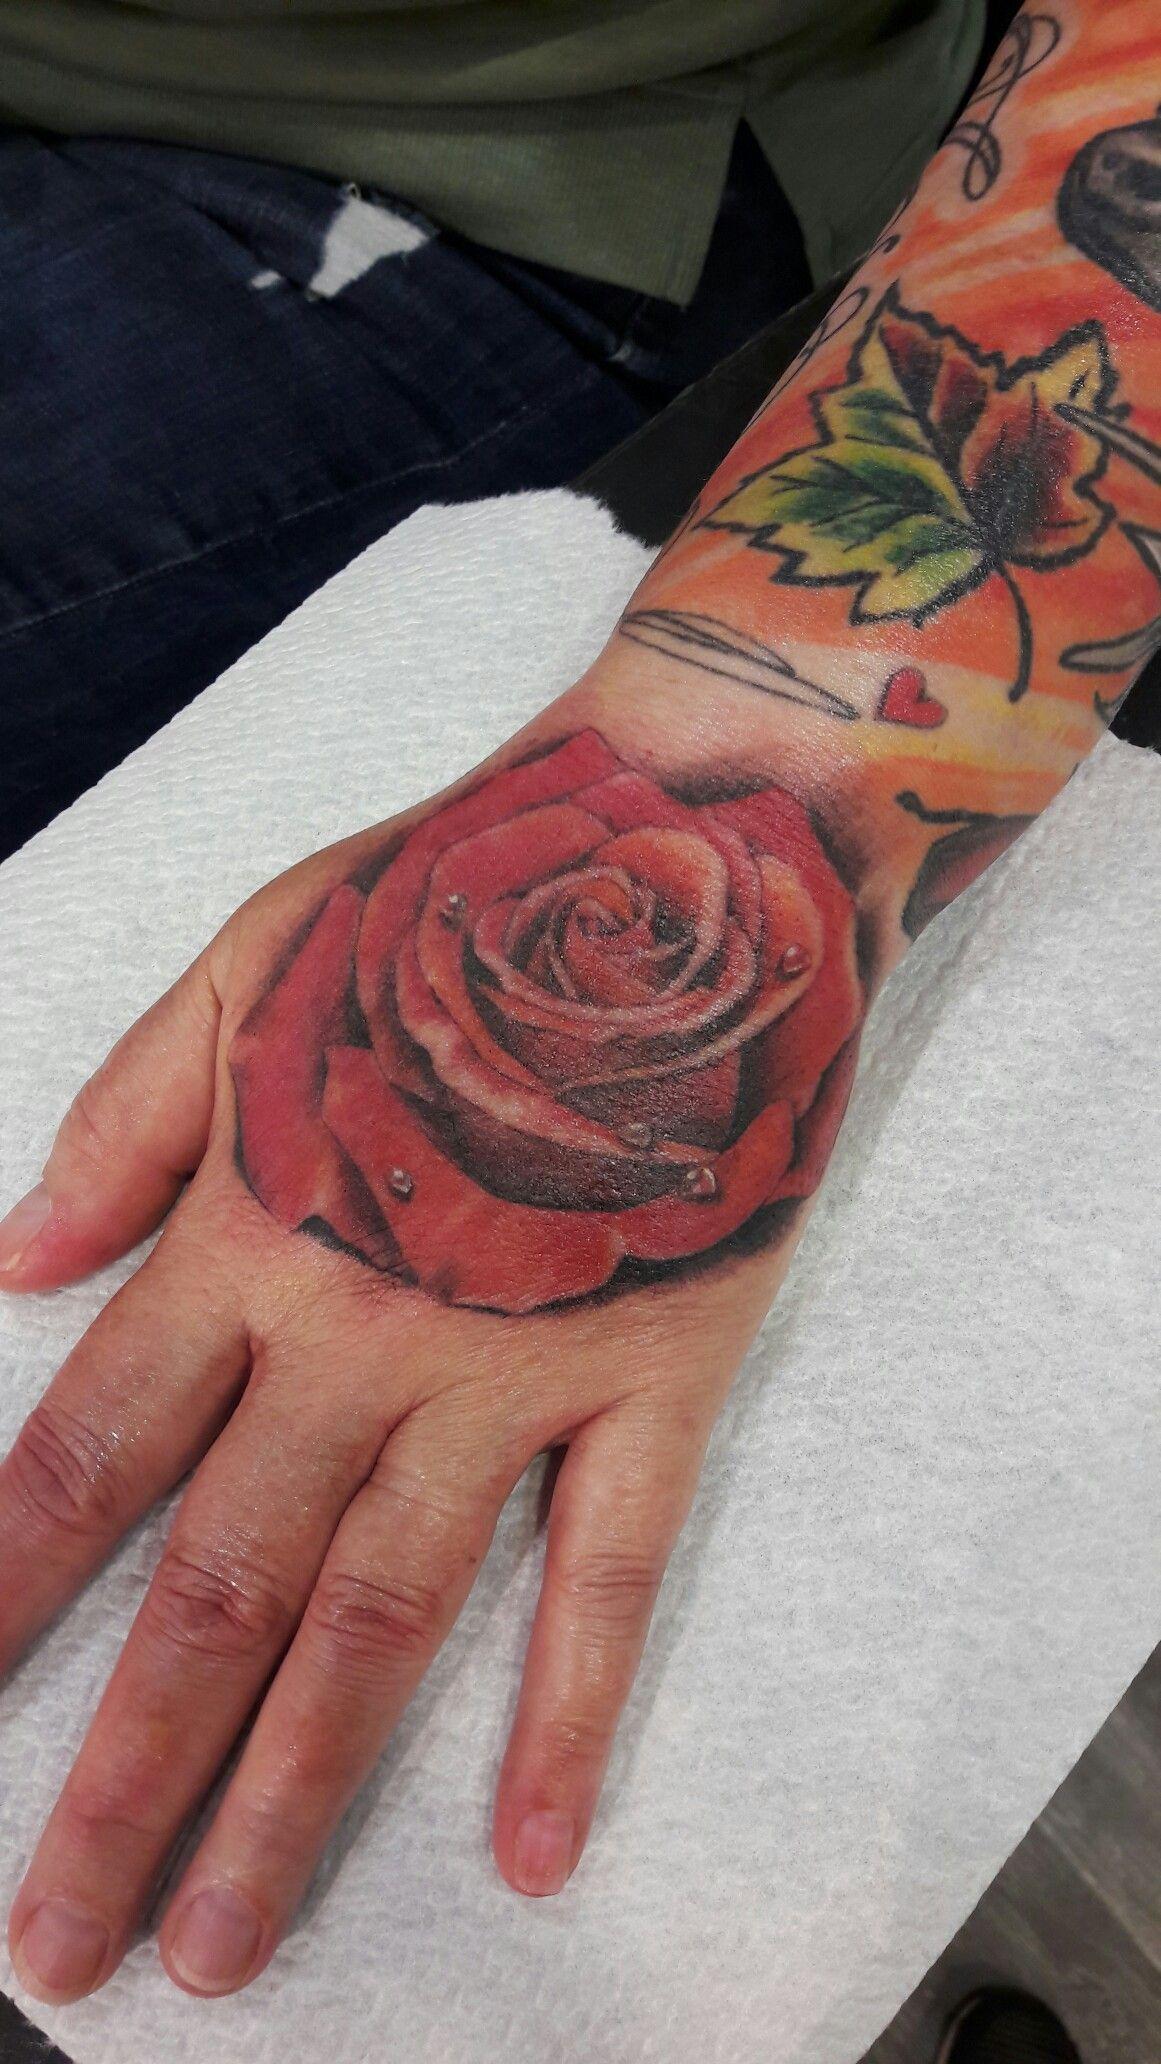 Tattoo roos hand.